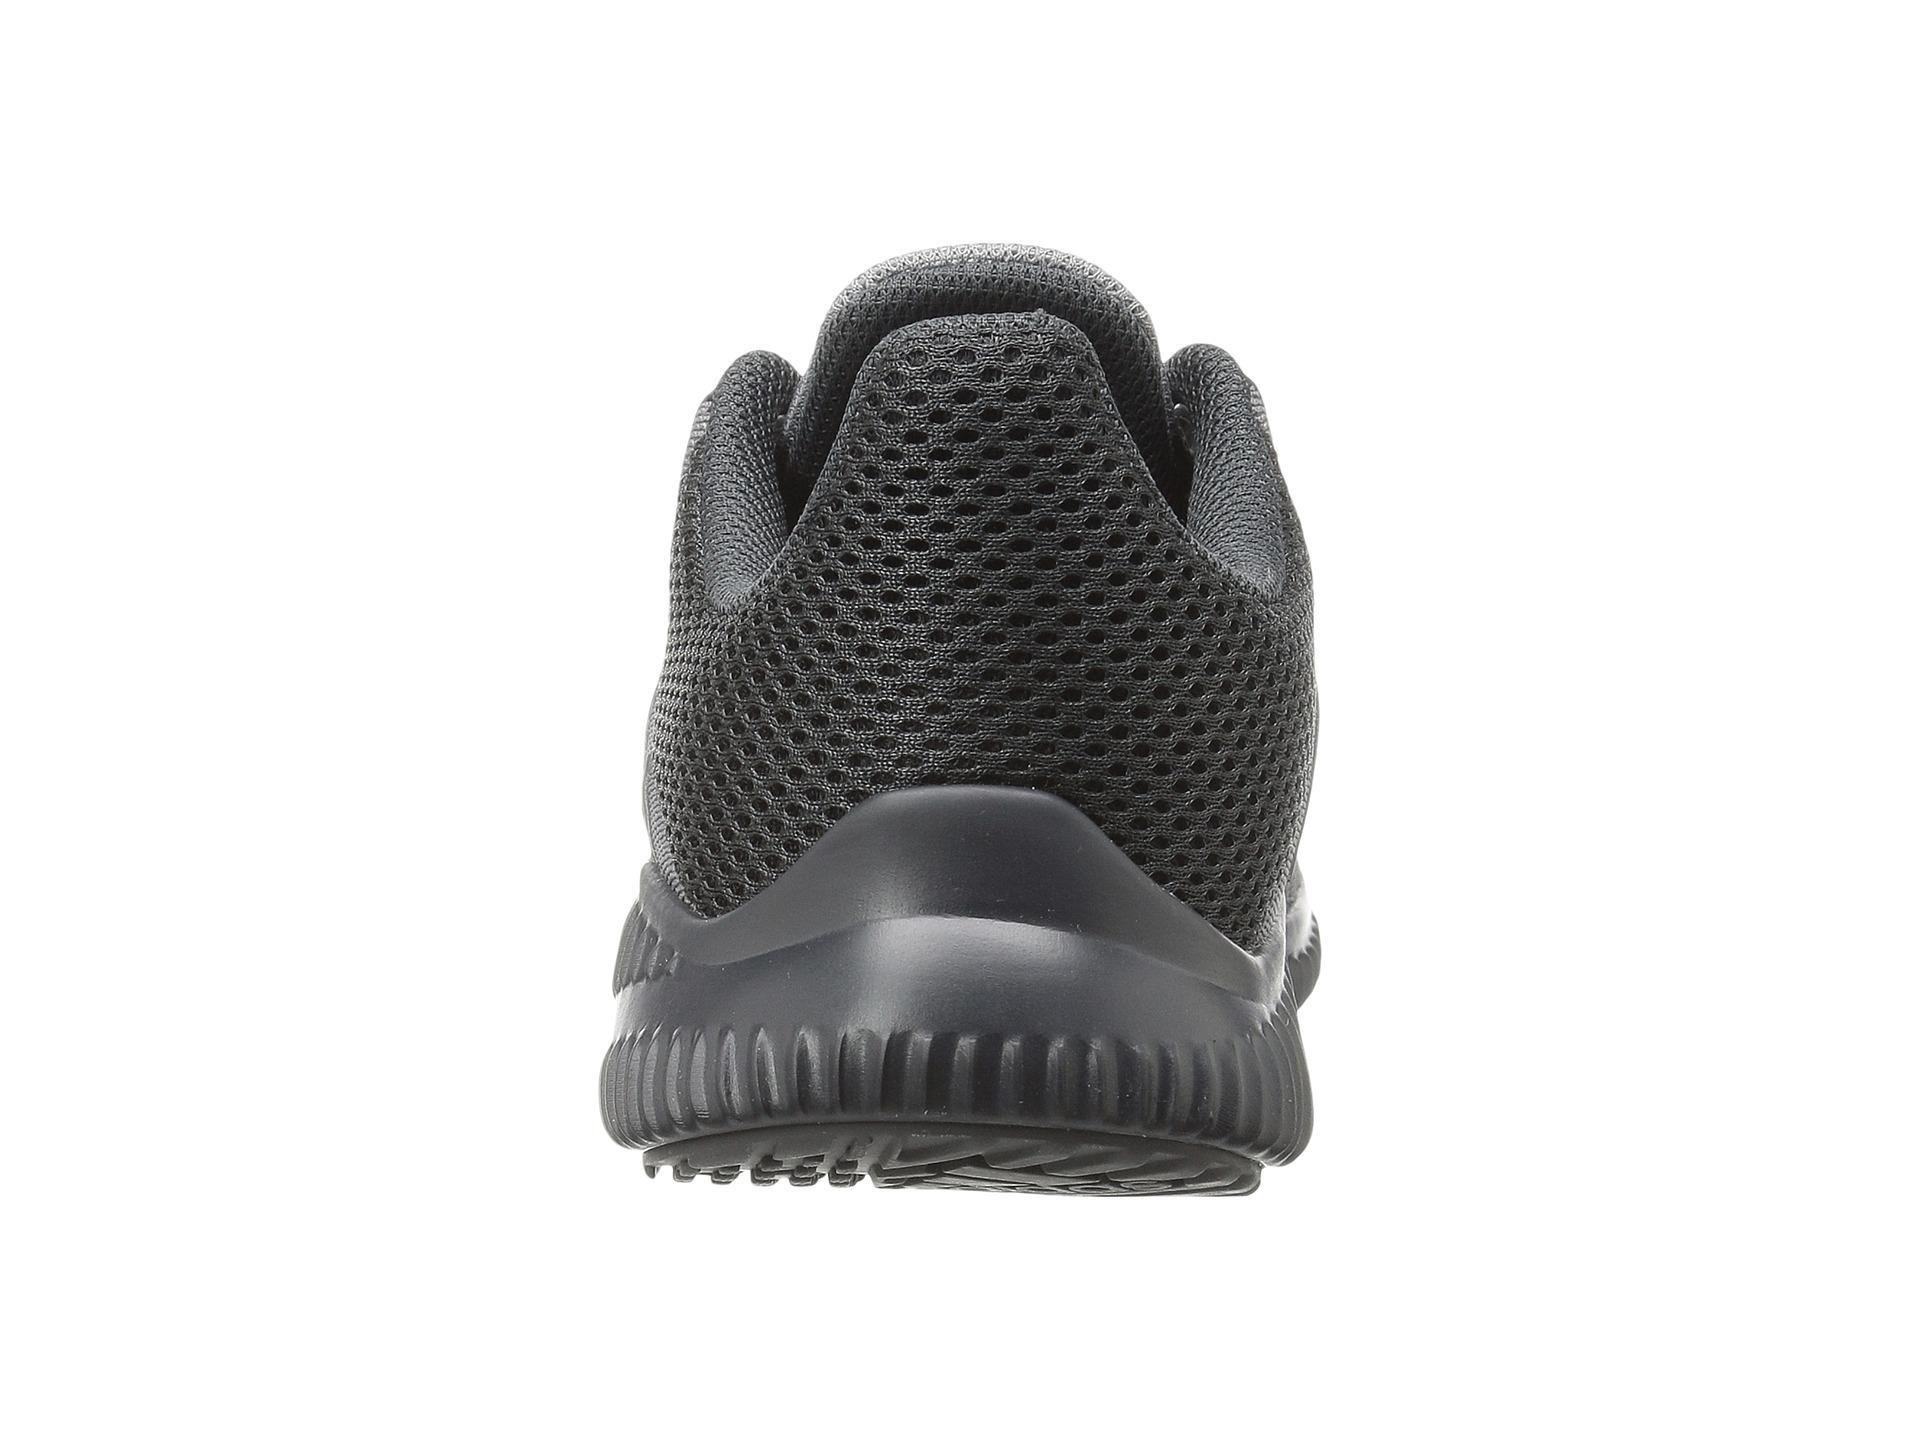 Adidas Kids Fortarun Shoe Size Chart